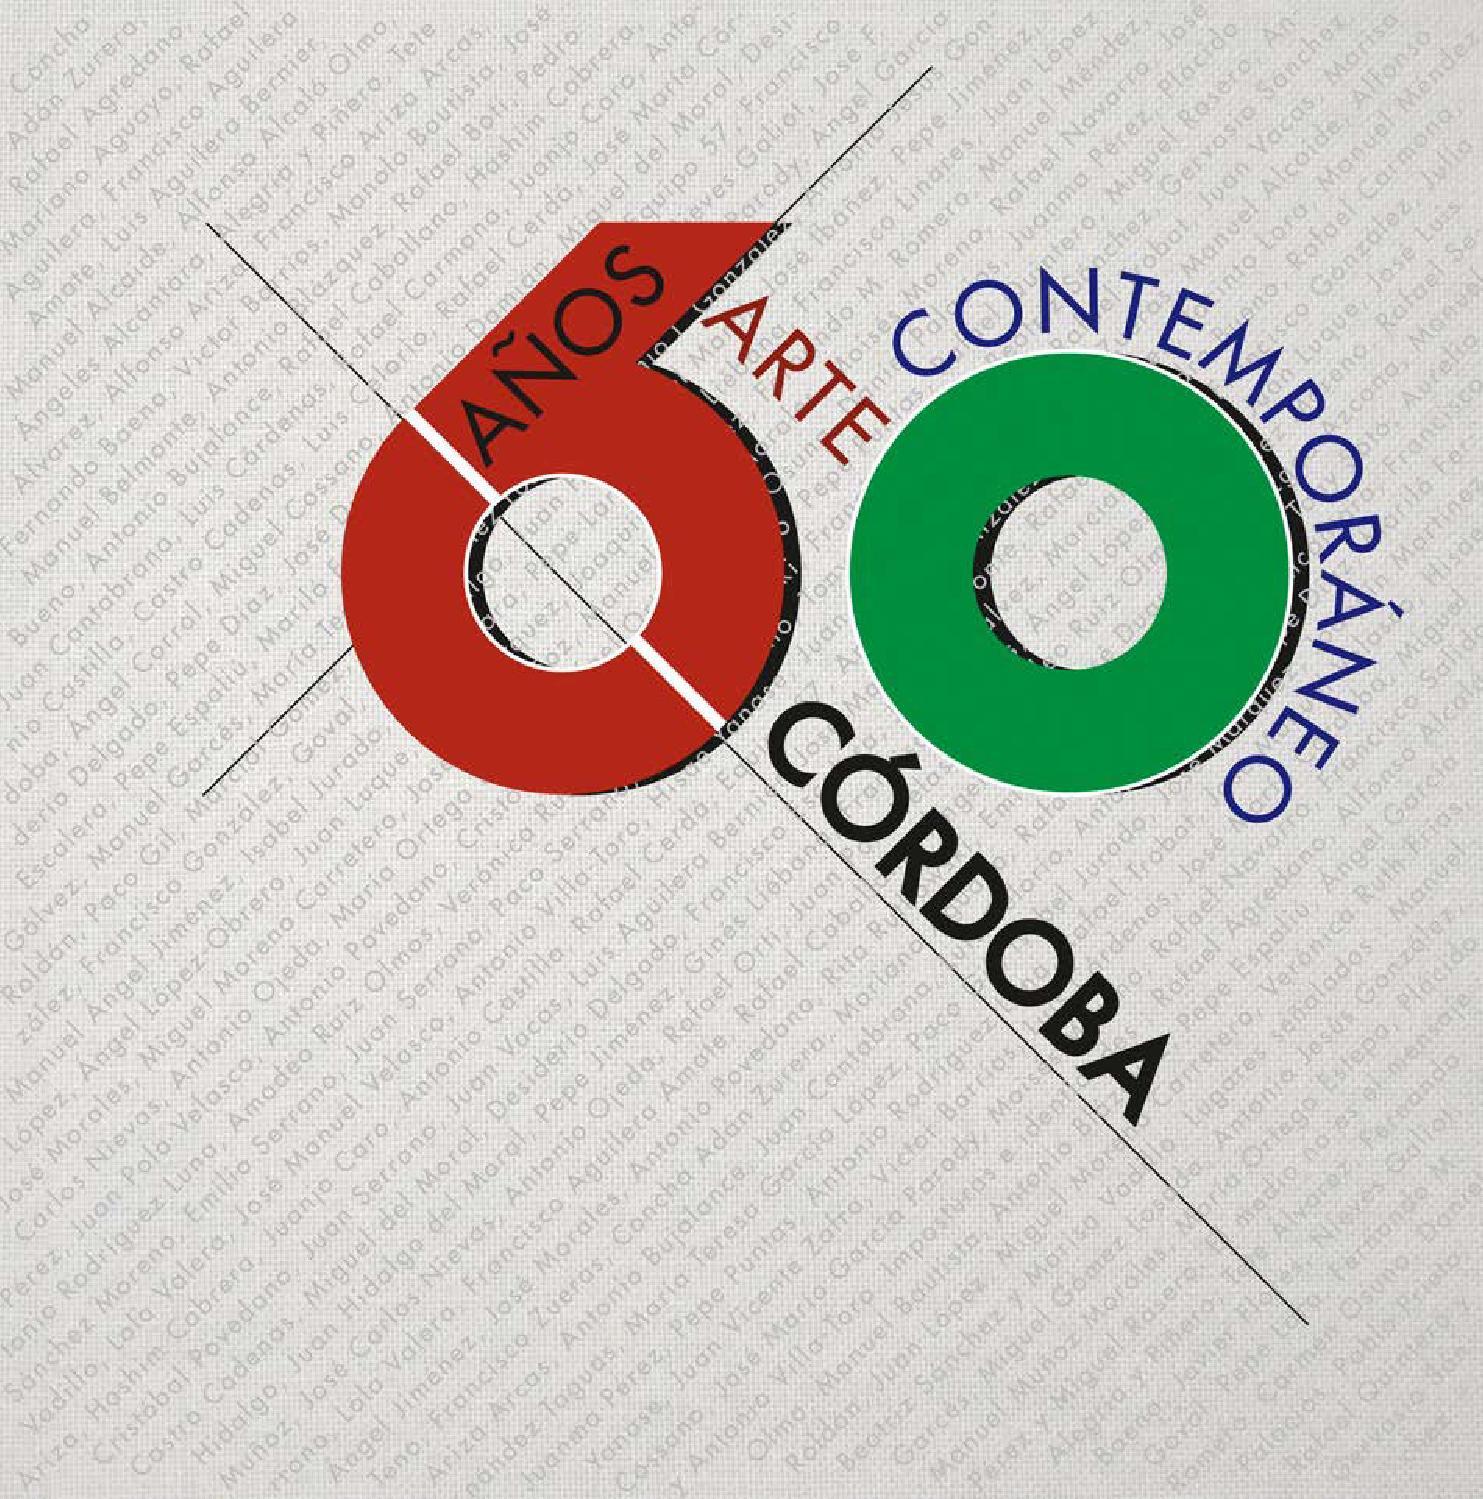 b66e9a5be41e 60 Años de Arte Contemporáneo en Córdoba by Angel Garcia Roldan - issuu